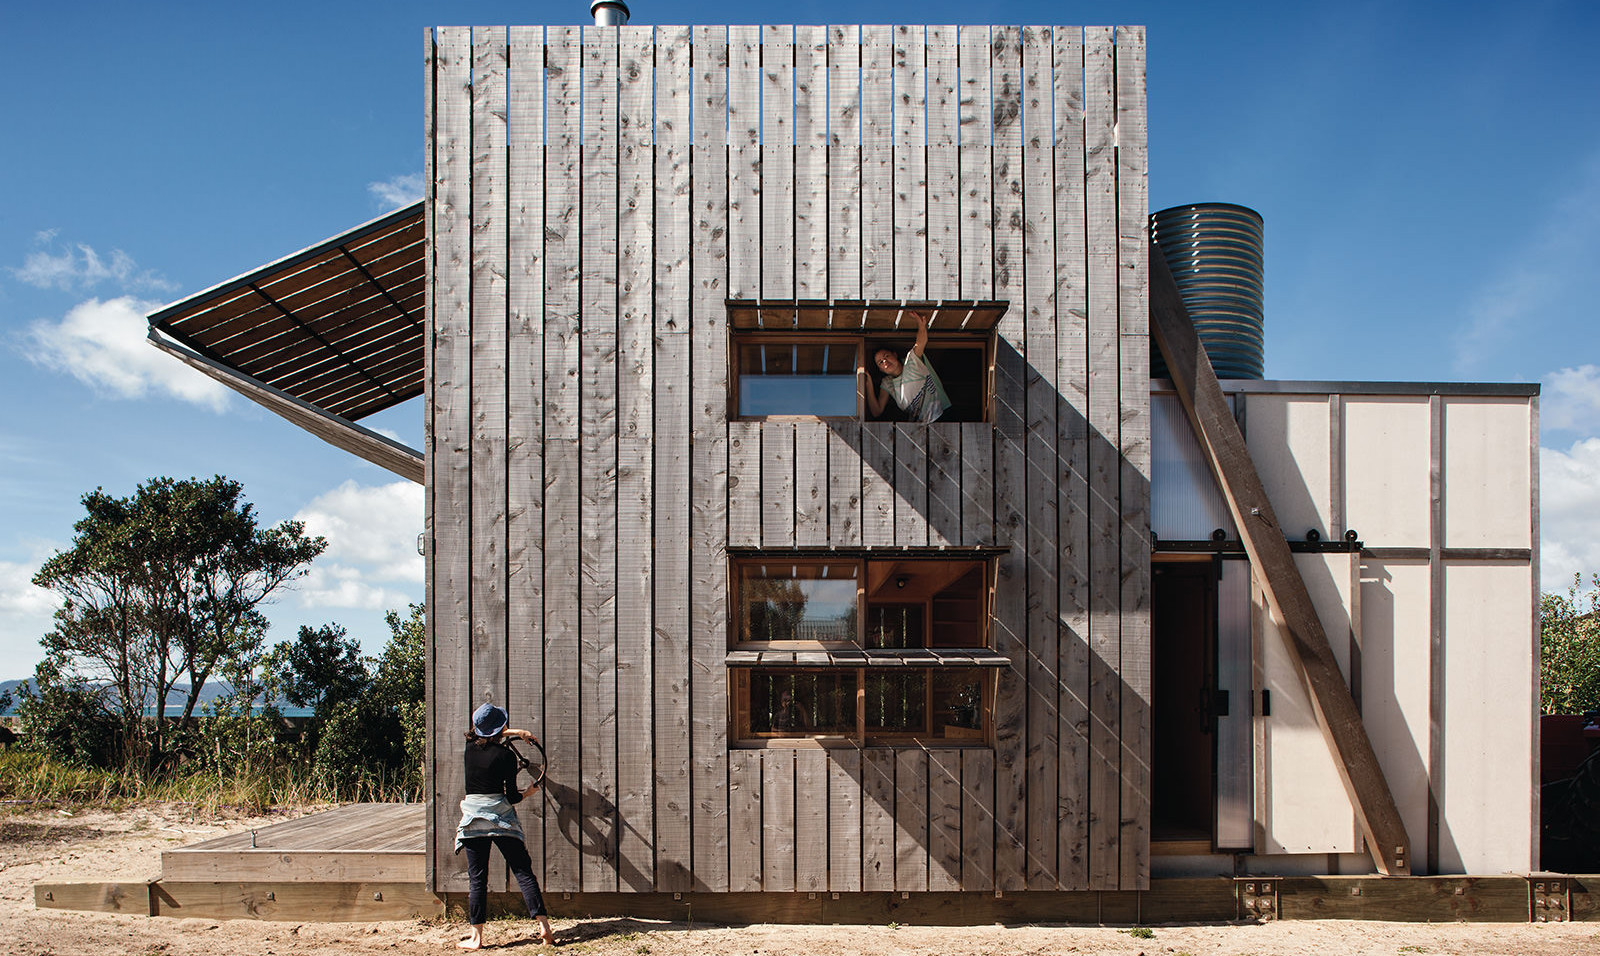 hut-on-sleds-crosson-architects.jpg